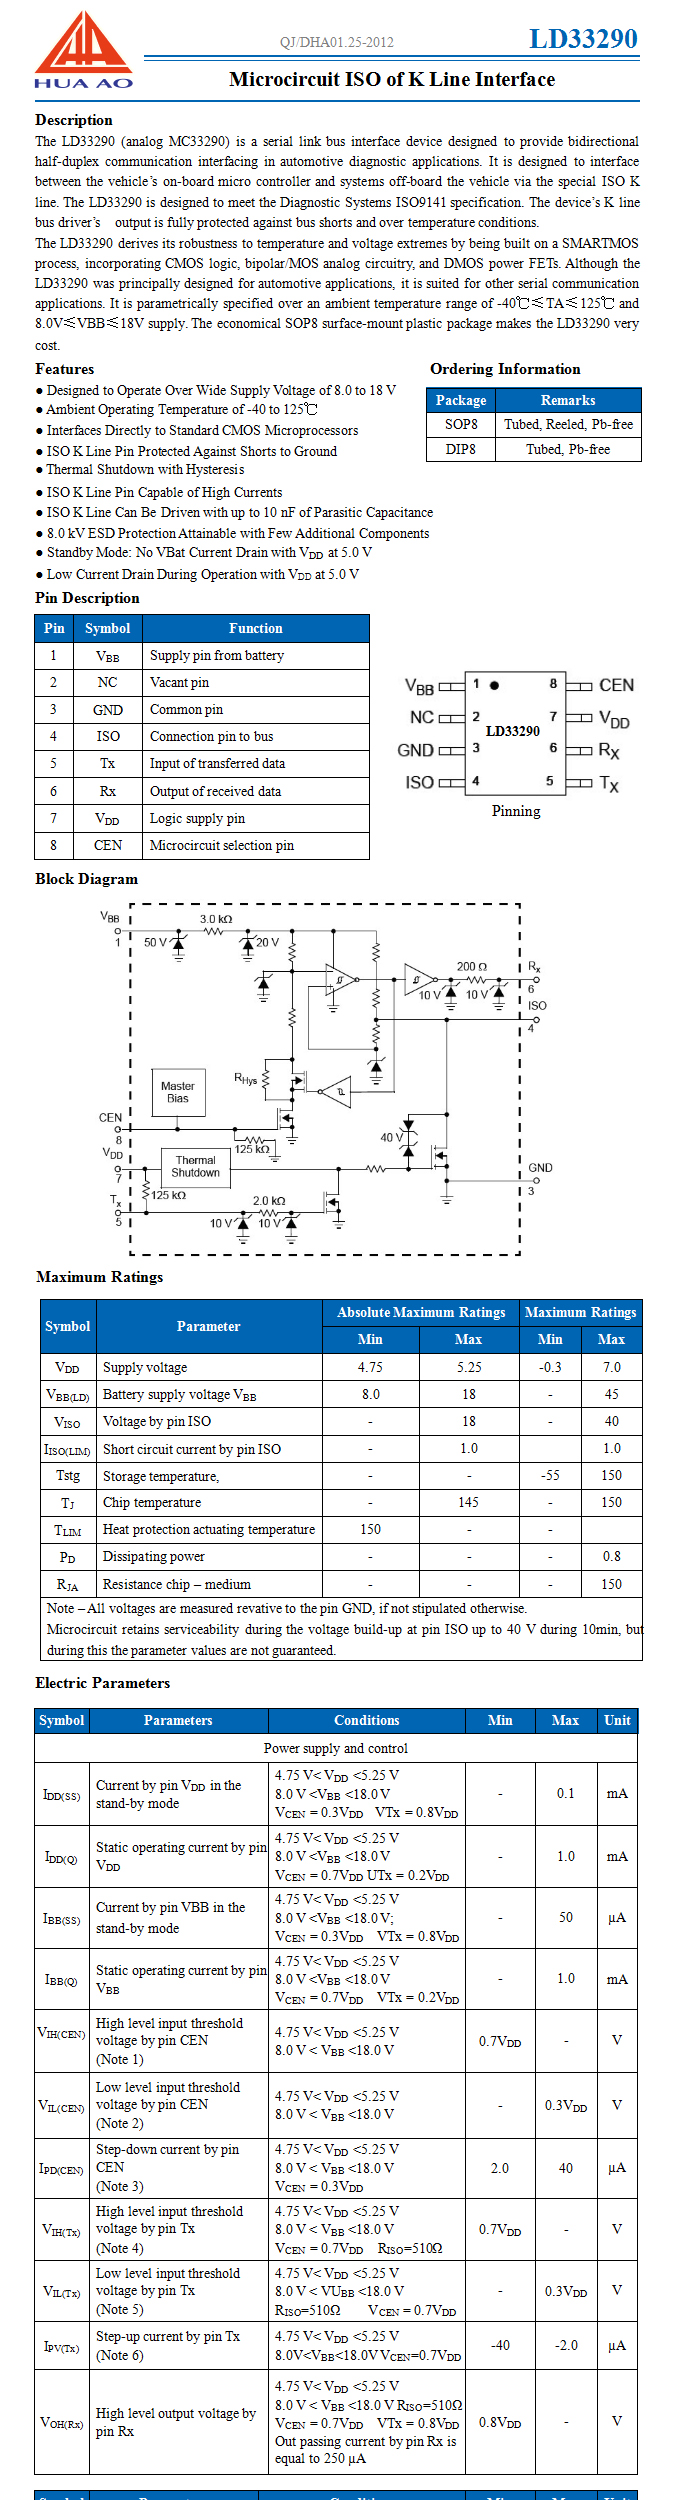 LD33290 Microcircuit ISO of K Line Interface ASIC - 丹东华奥